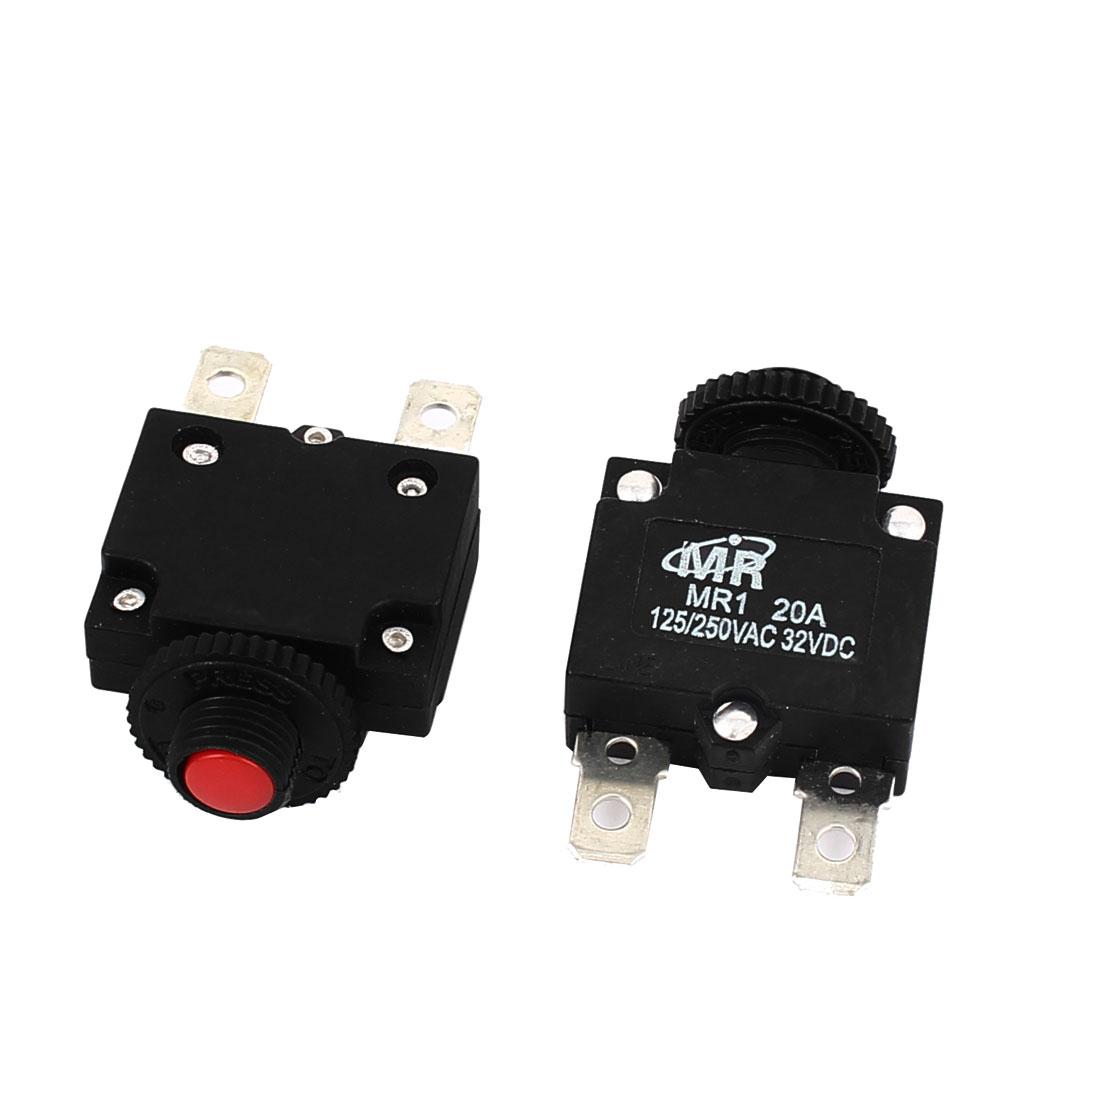 AC 125V/250V 20A NC Hand Reset Button Overload Protector Circuit Breaker 2Pcs